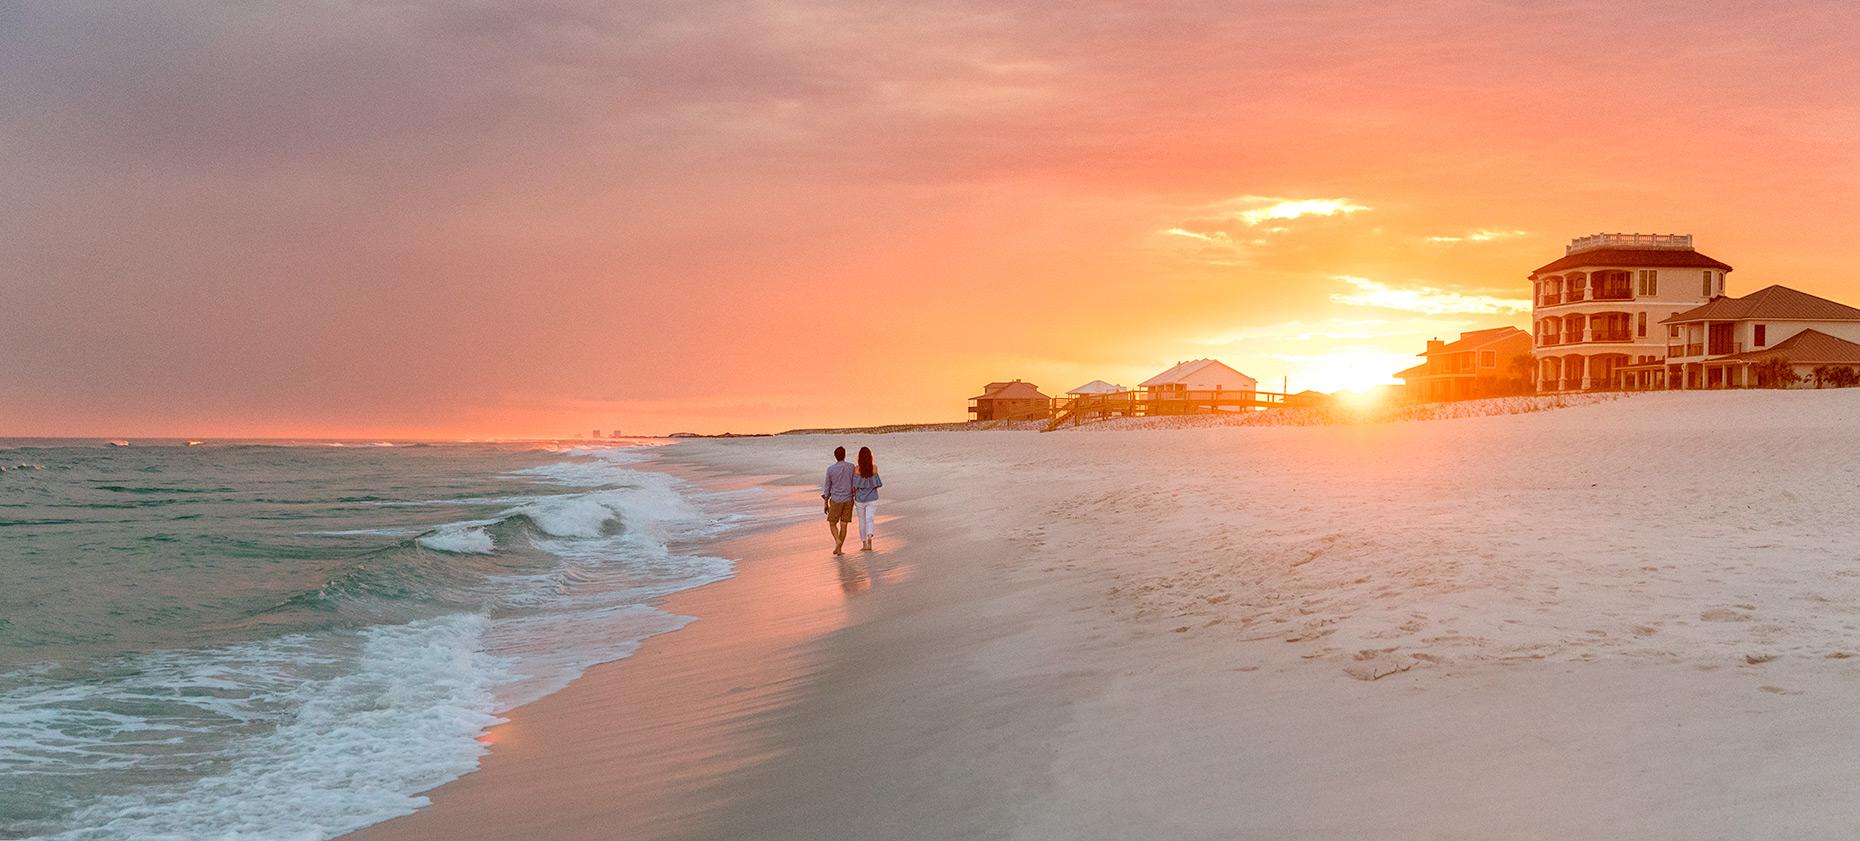 BEACH.SUNSET.COUPLE.jpg